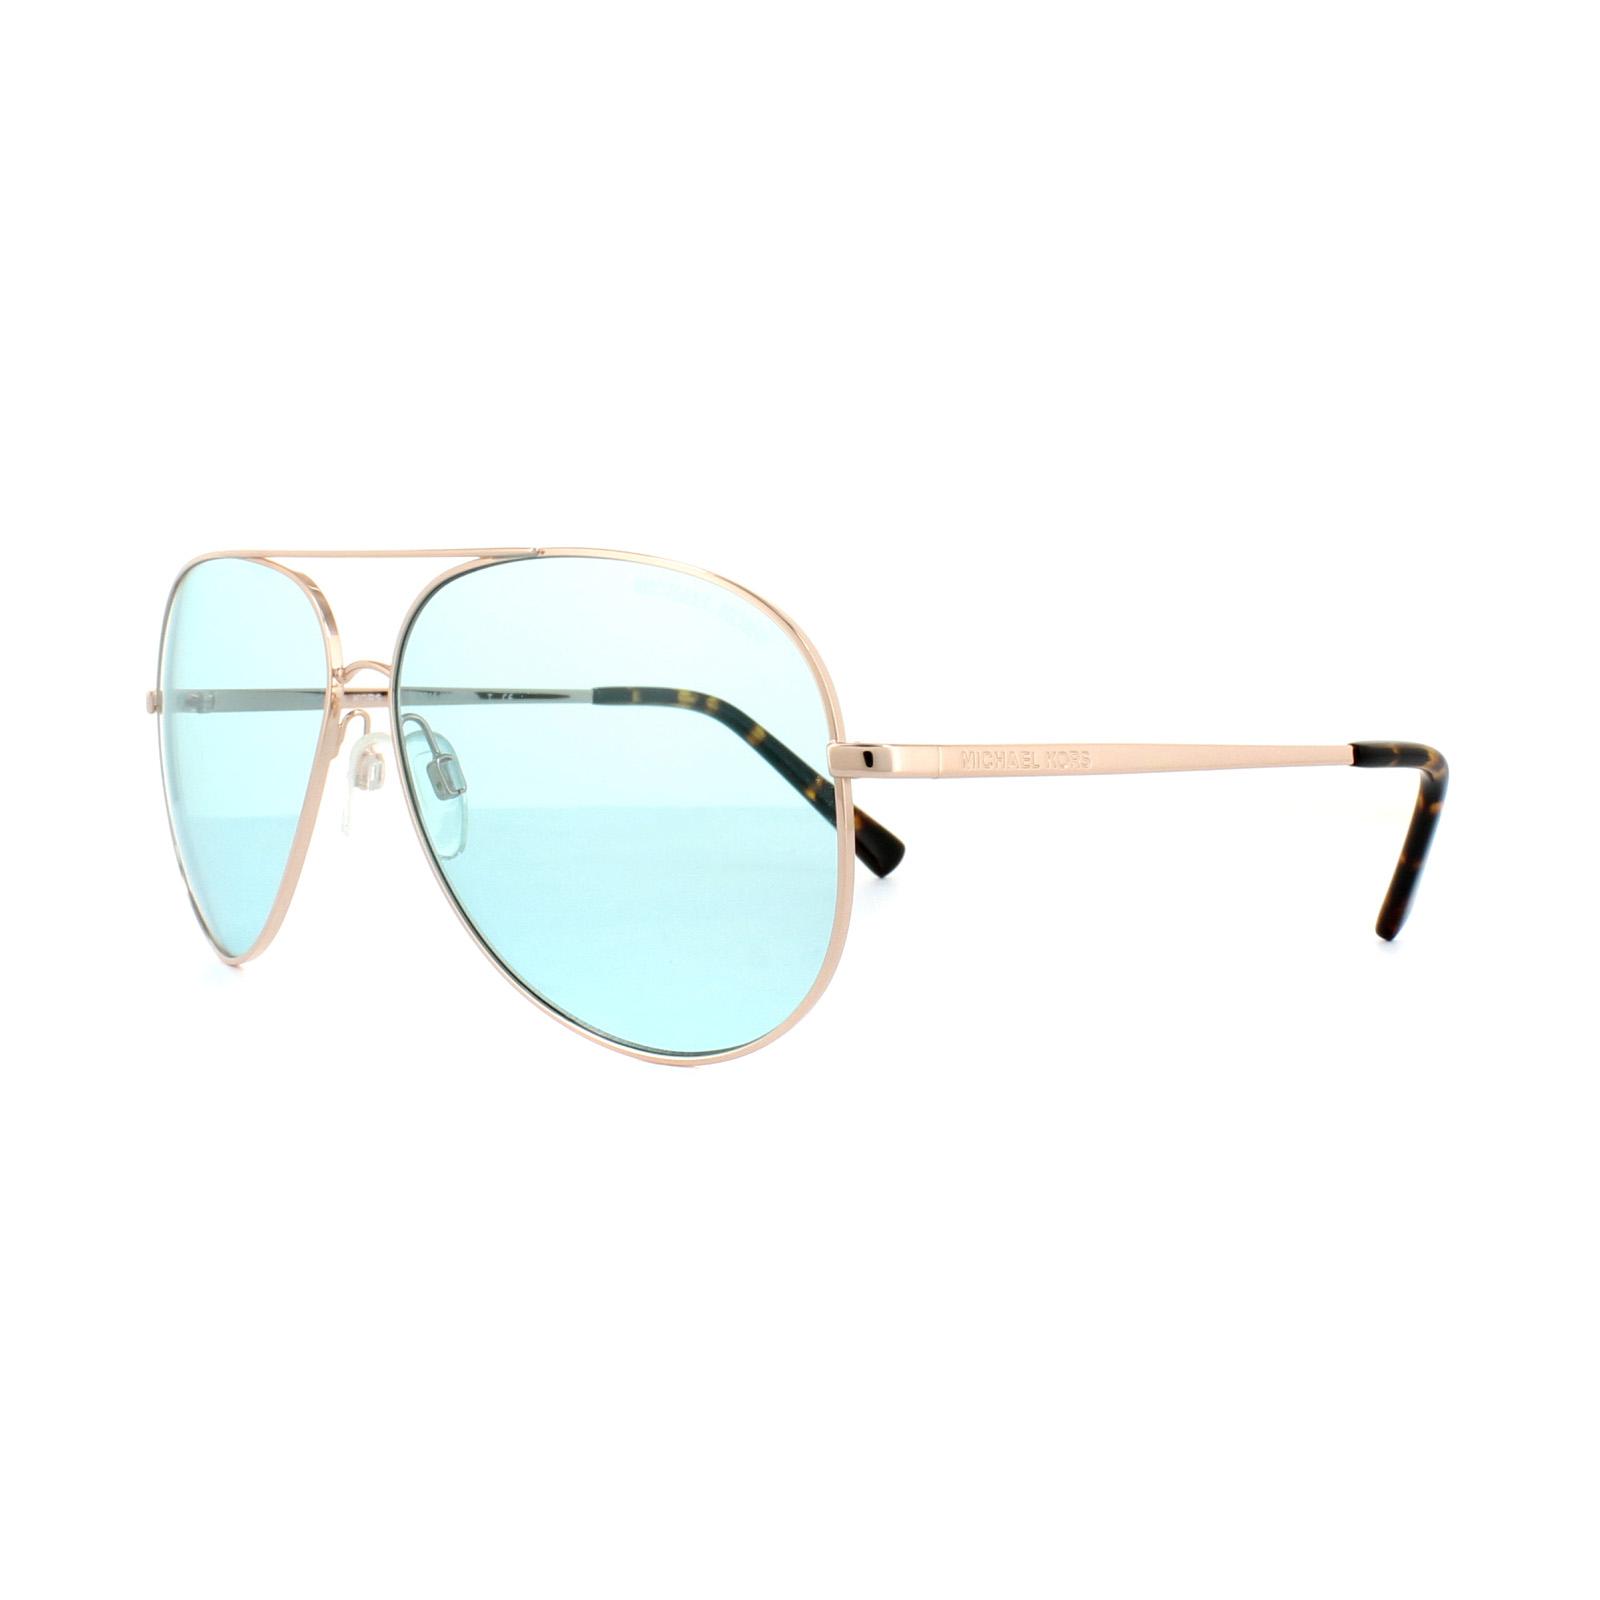 c9b19efec0 Michael Kors Sunglasses Kendall 1 5016 1026 65 Rose Gold Teal ...